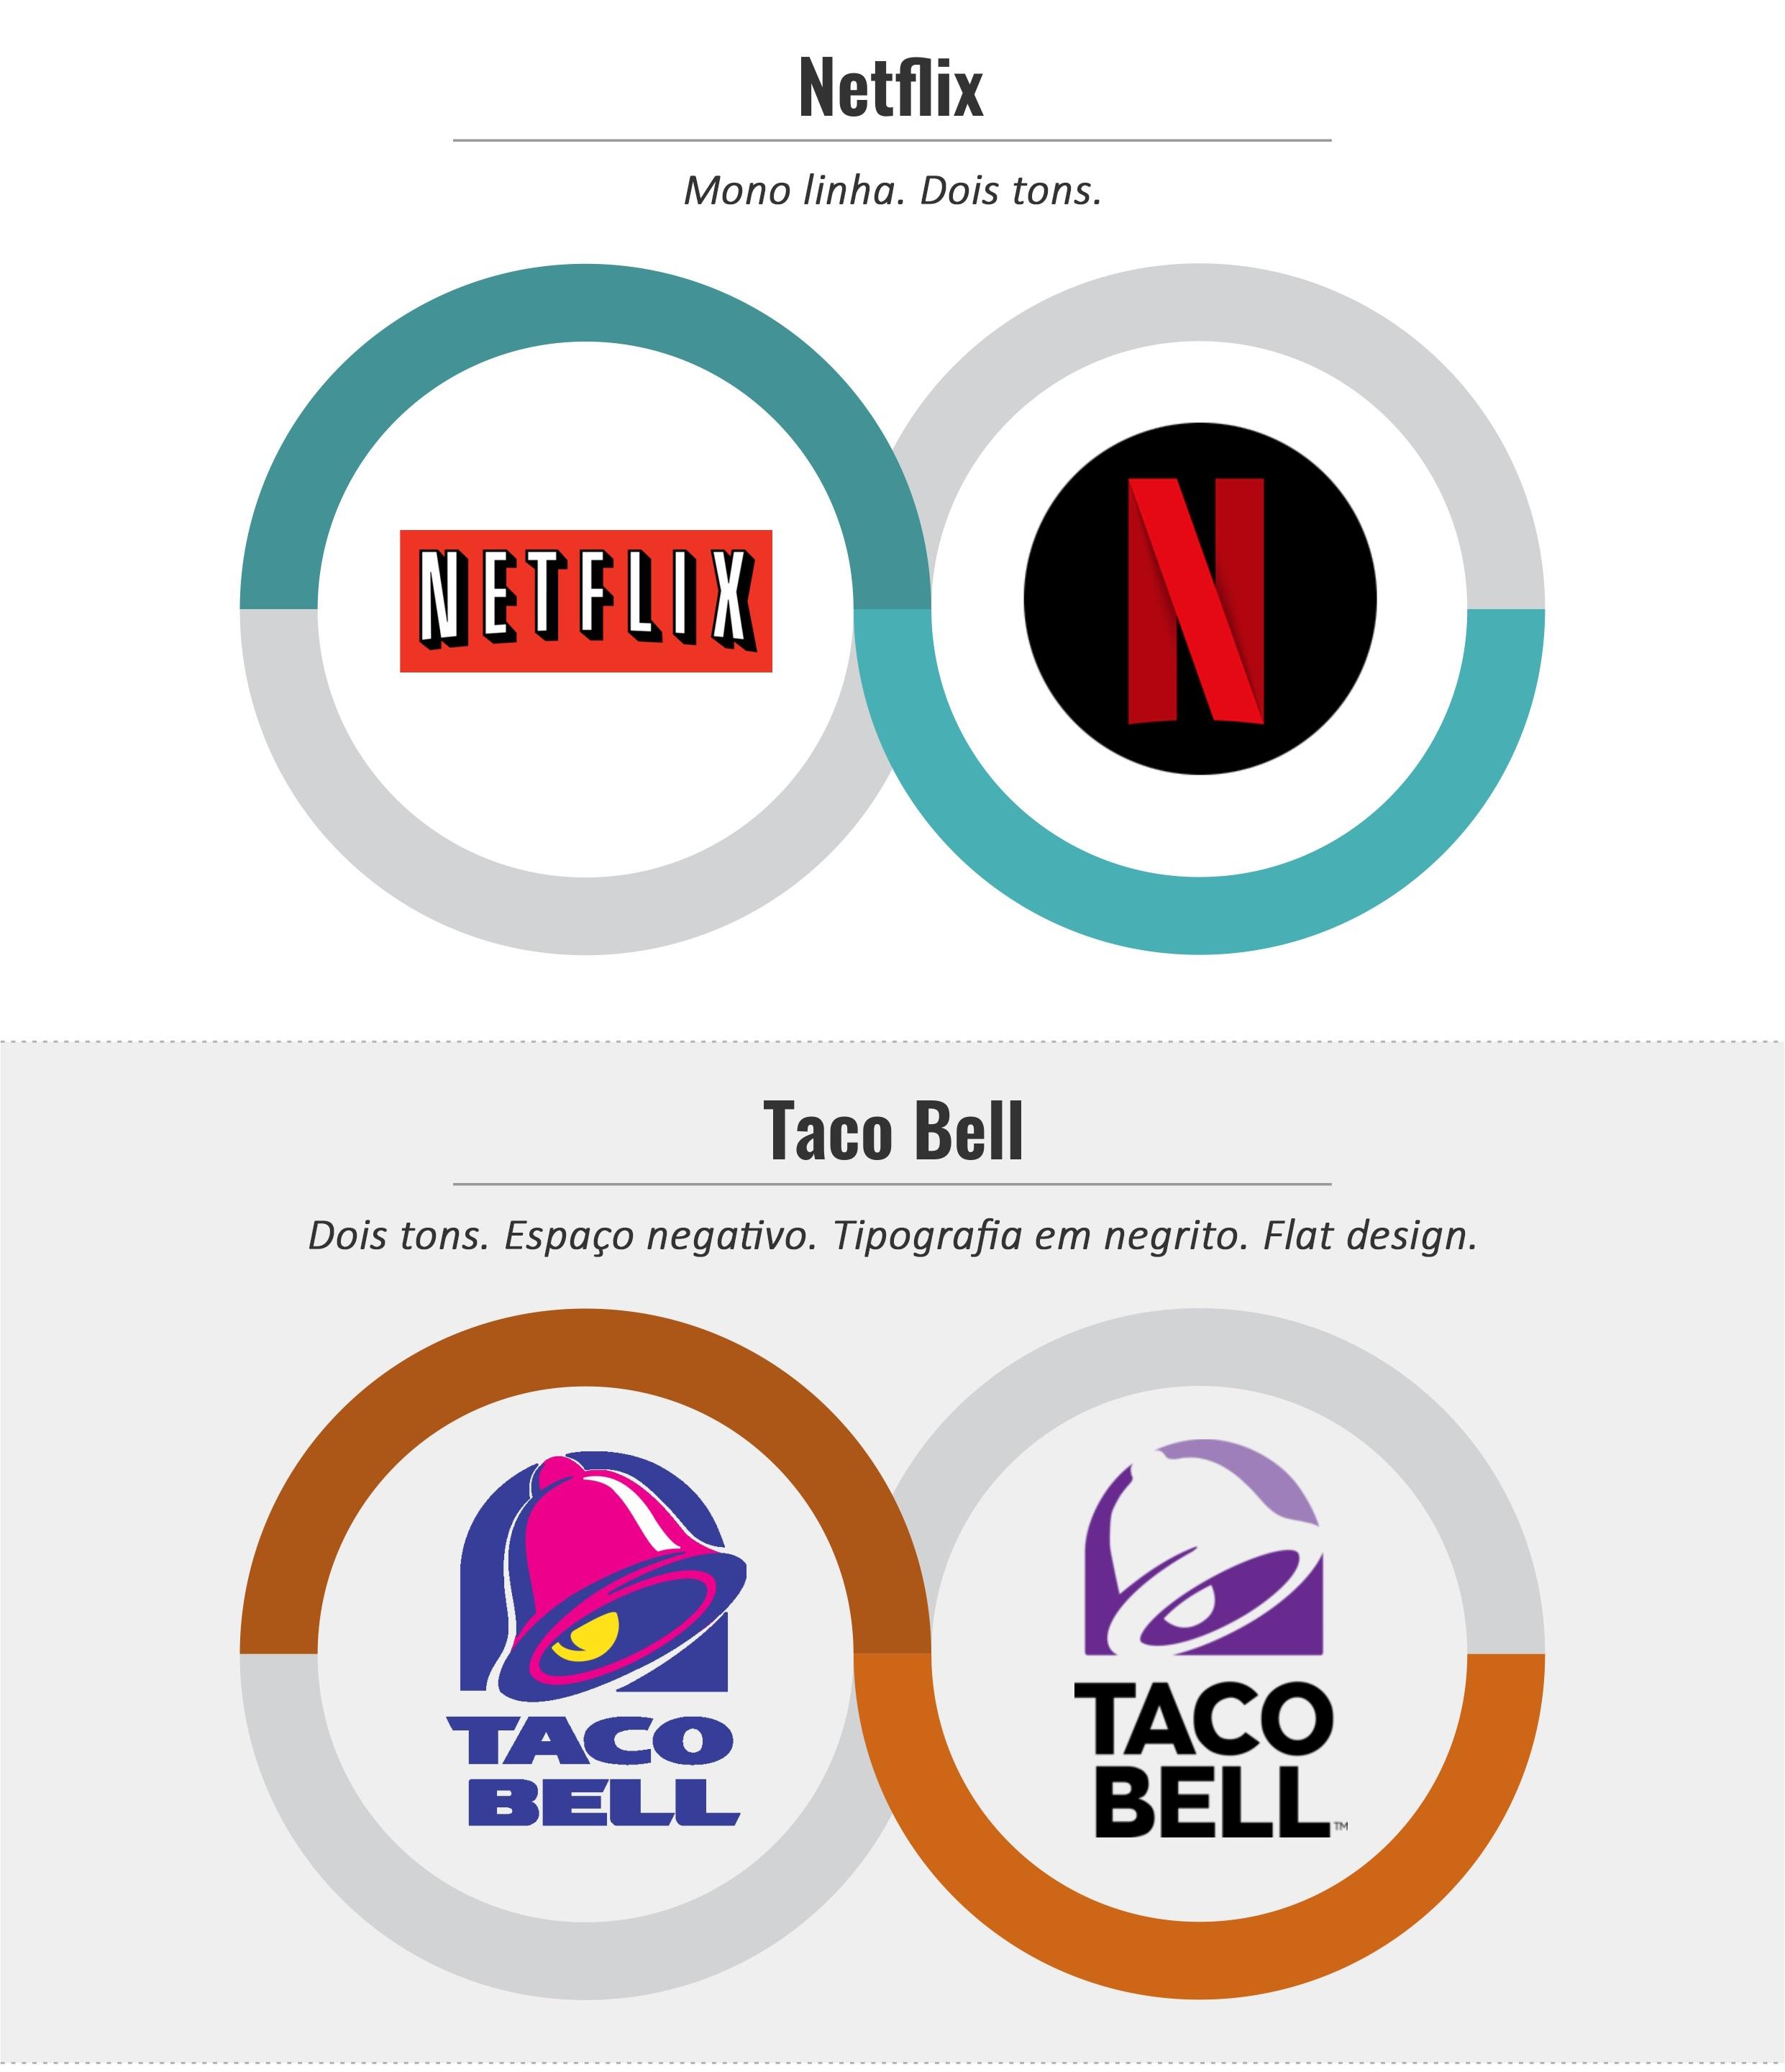 Logos Netflix e Taco Bell